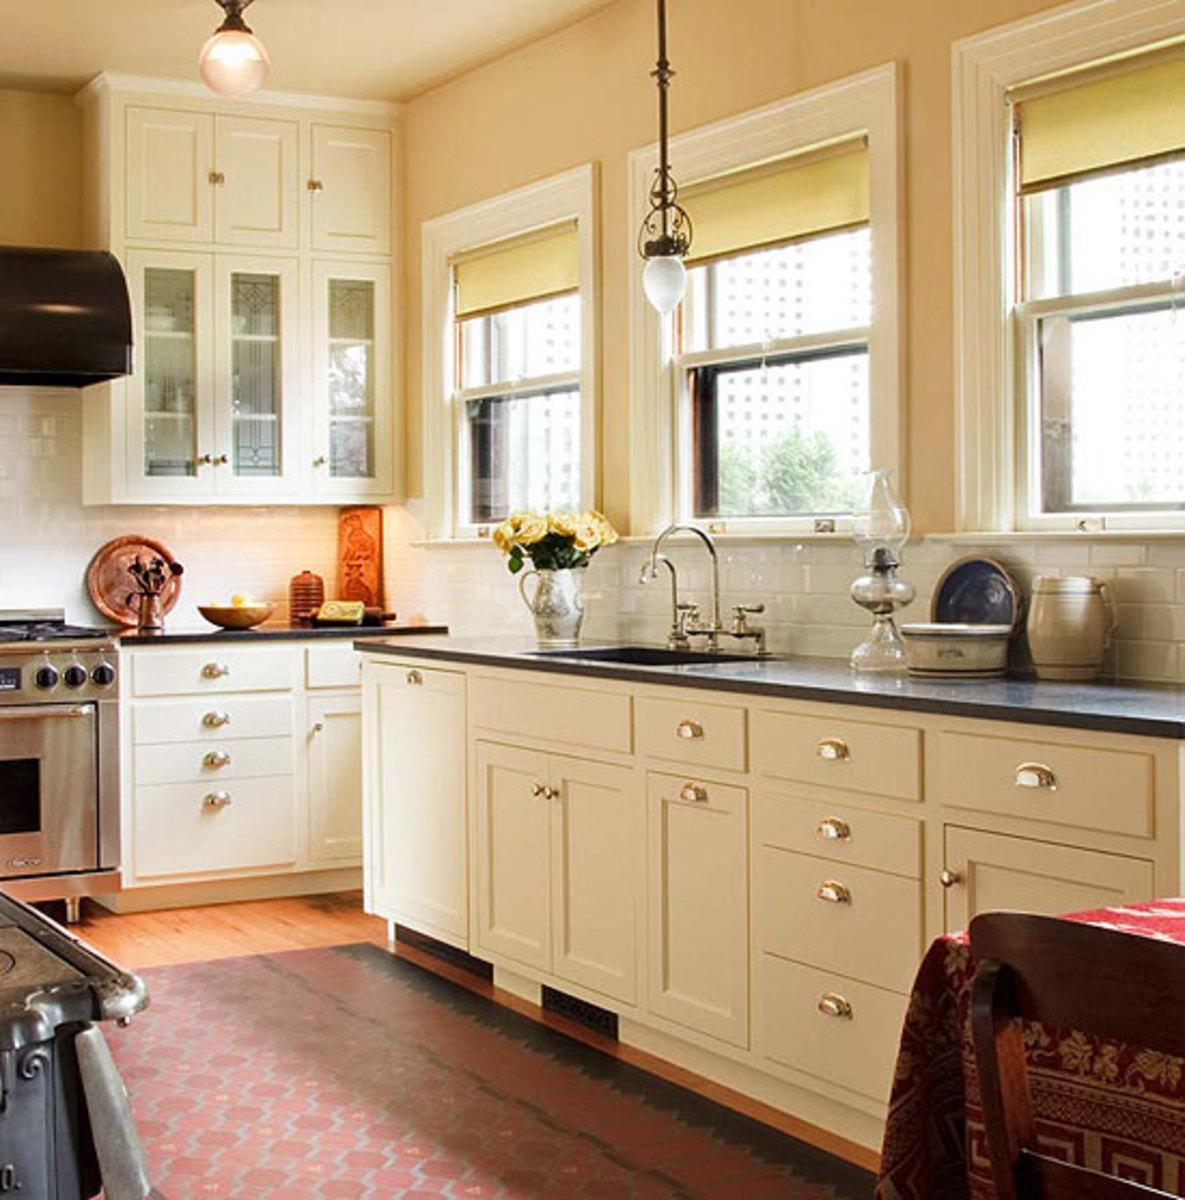 Kitchen Sinks & Countertops: Go Trendy or Timeless? - Arts ... on Backsplash For Black Countertops  id=55430